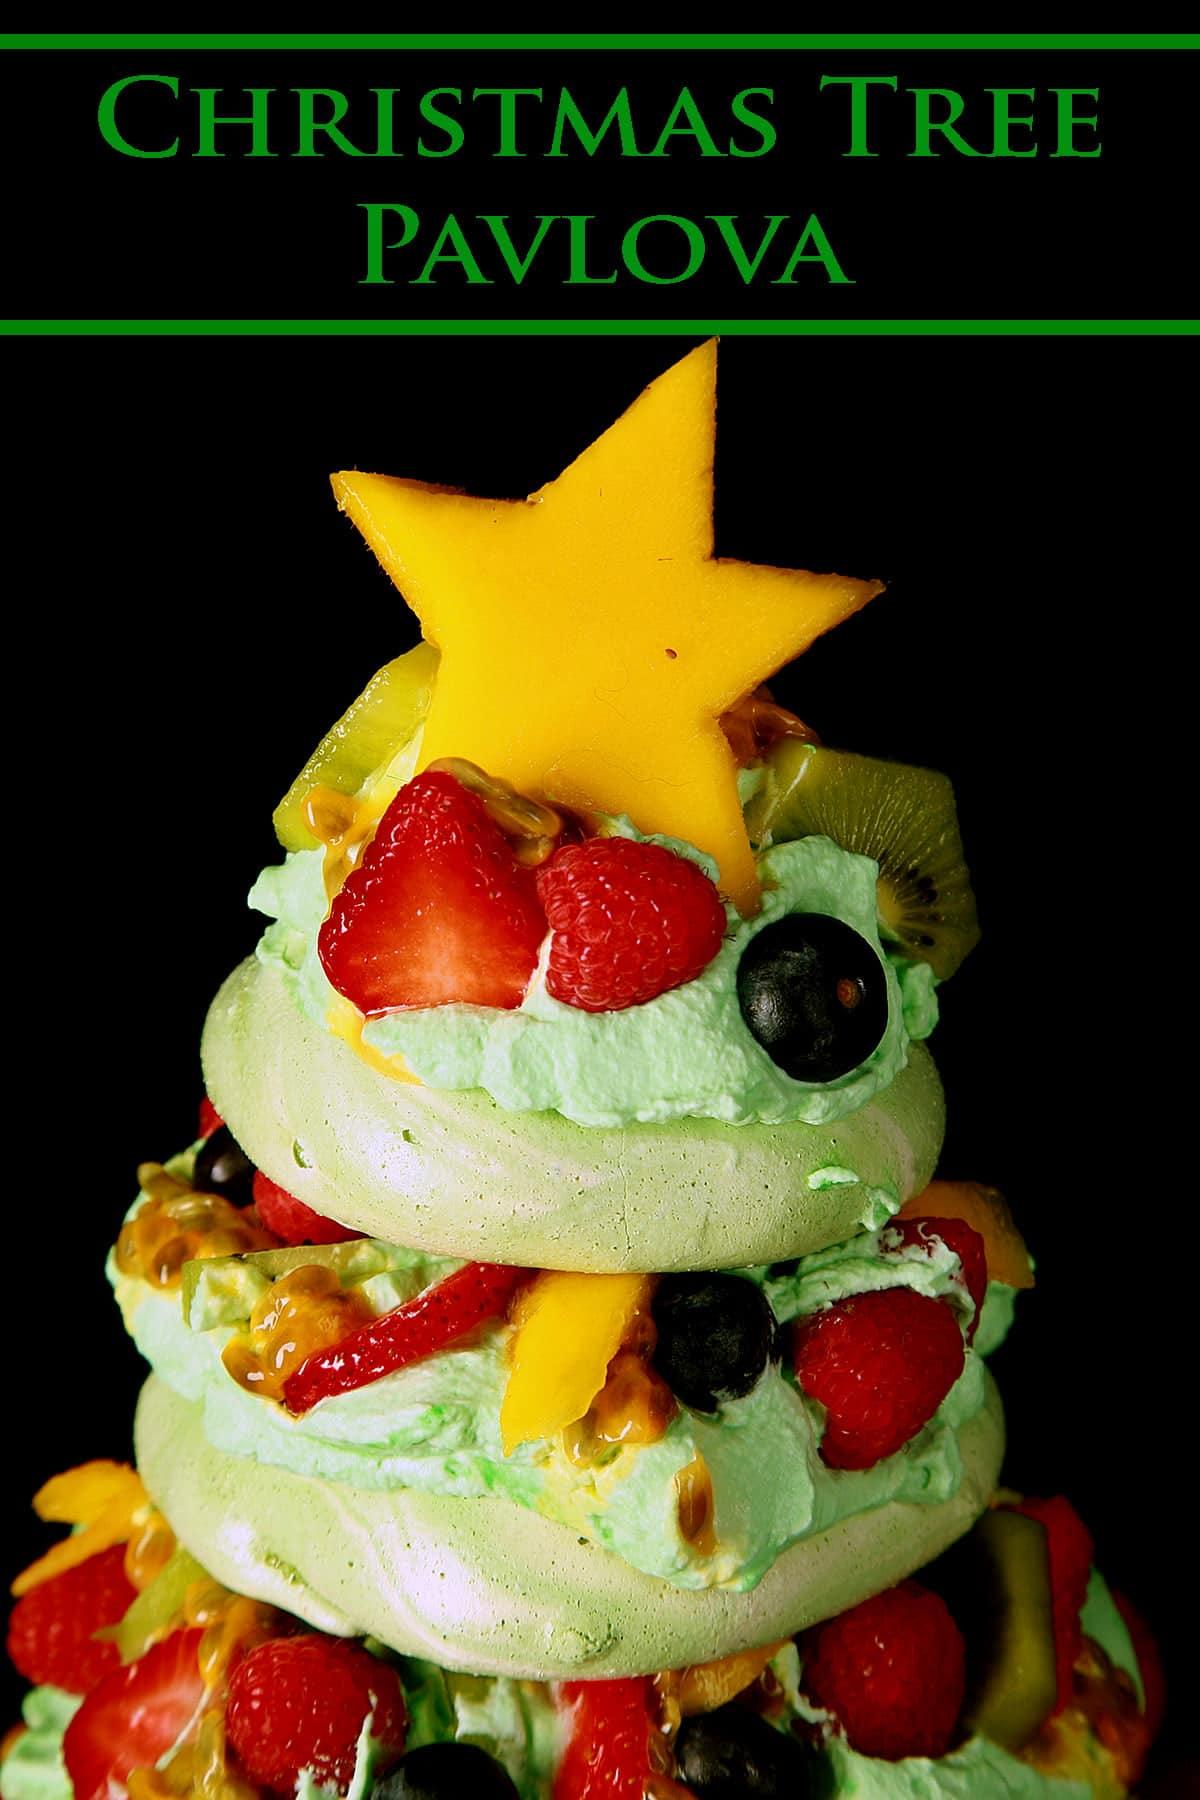 The top 3 layers of a Christmas Tree themed Pavlova.